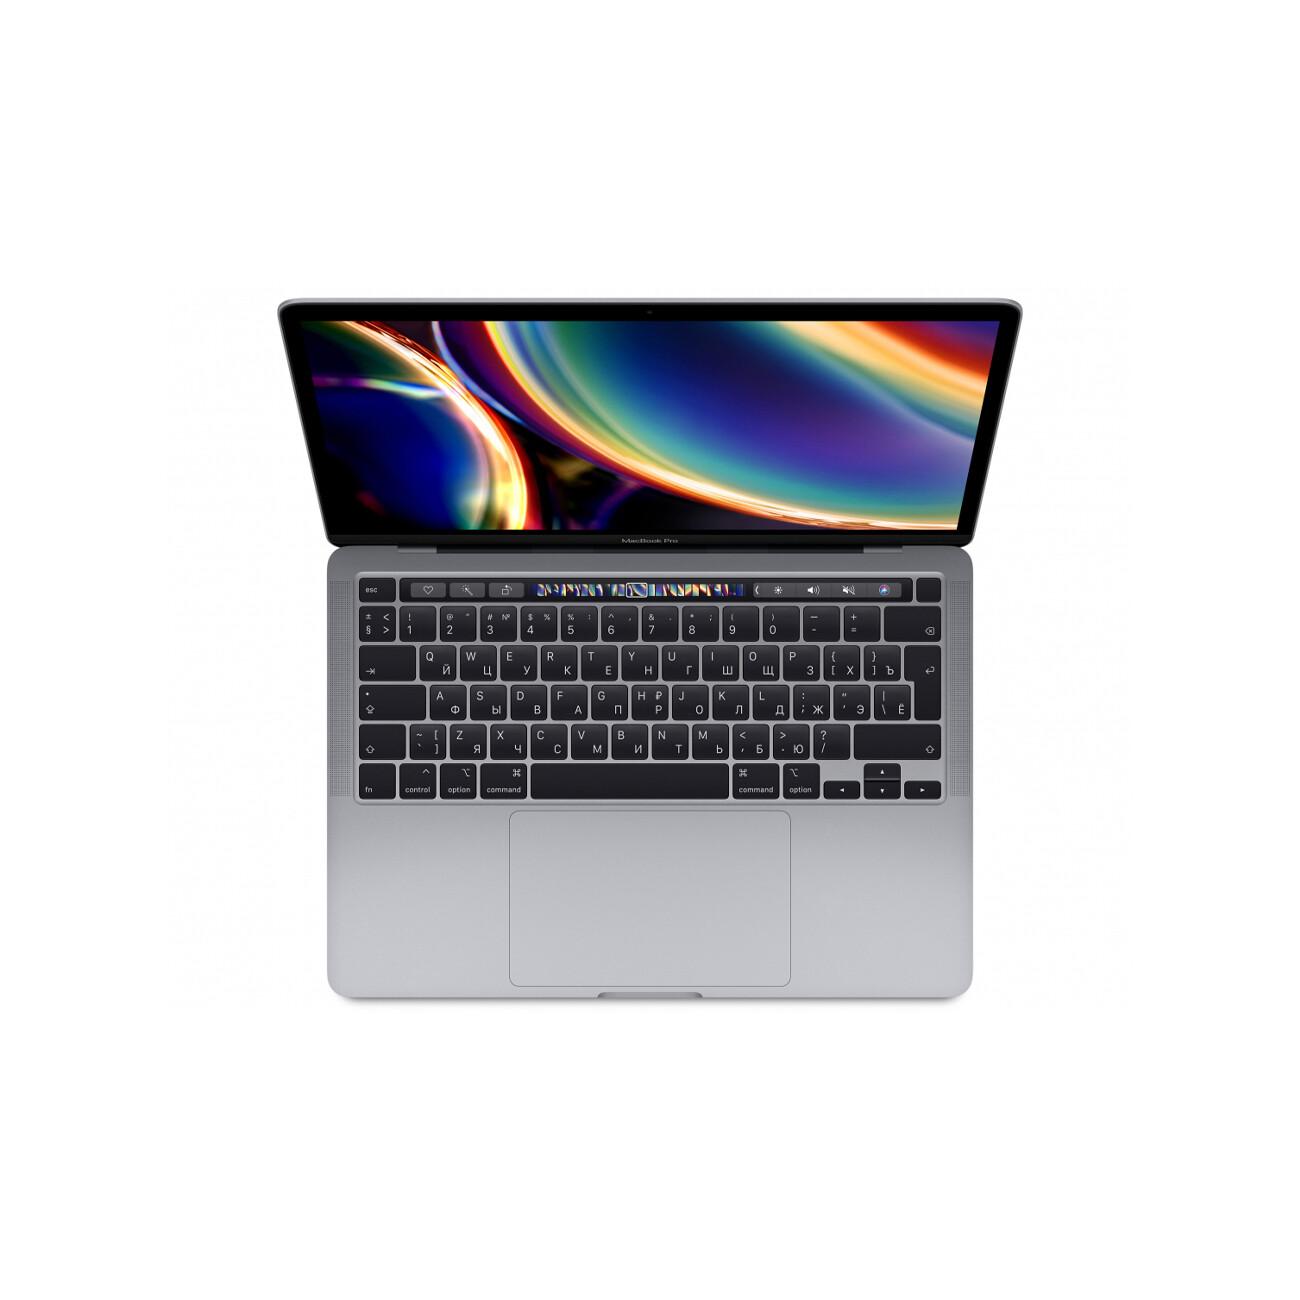 "Apple MacBook Pro 13"" QC i5 1,4 ГГц, 8 ГБ, 256 ГБ SSD, Iris Plus 645, Touch Bar, «серый космос»"